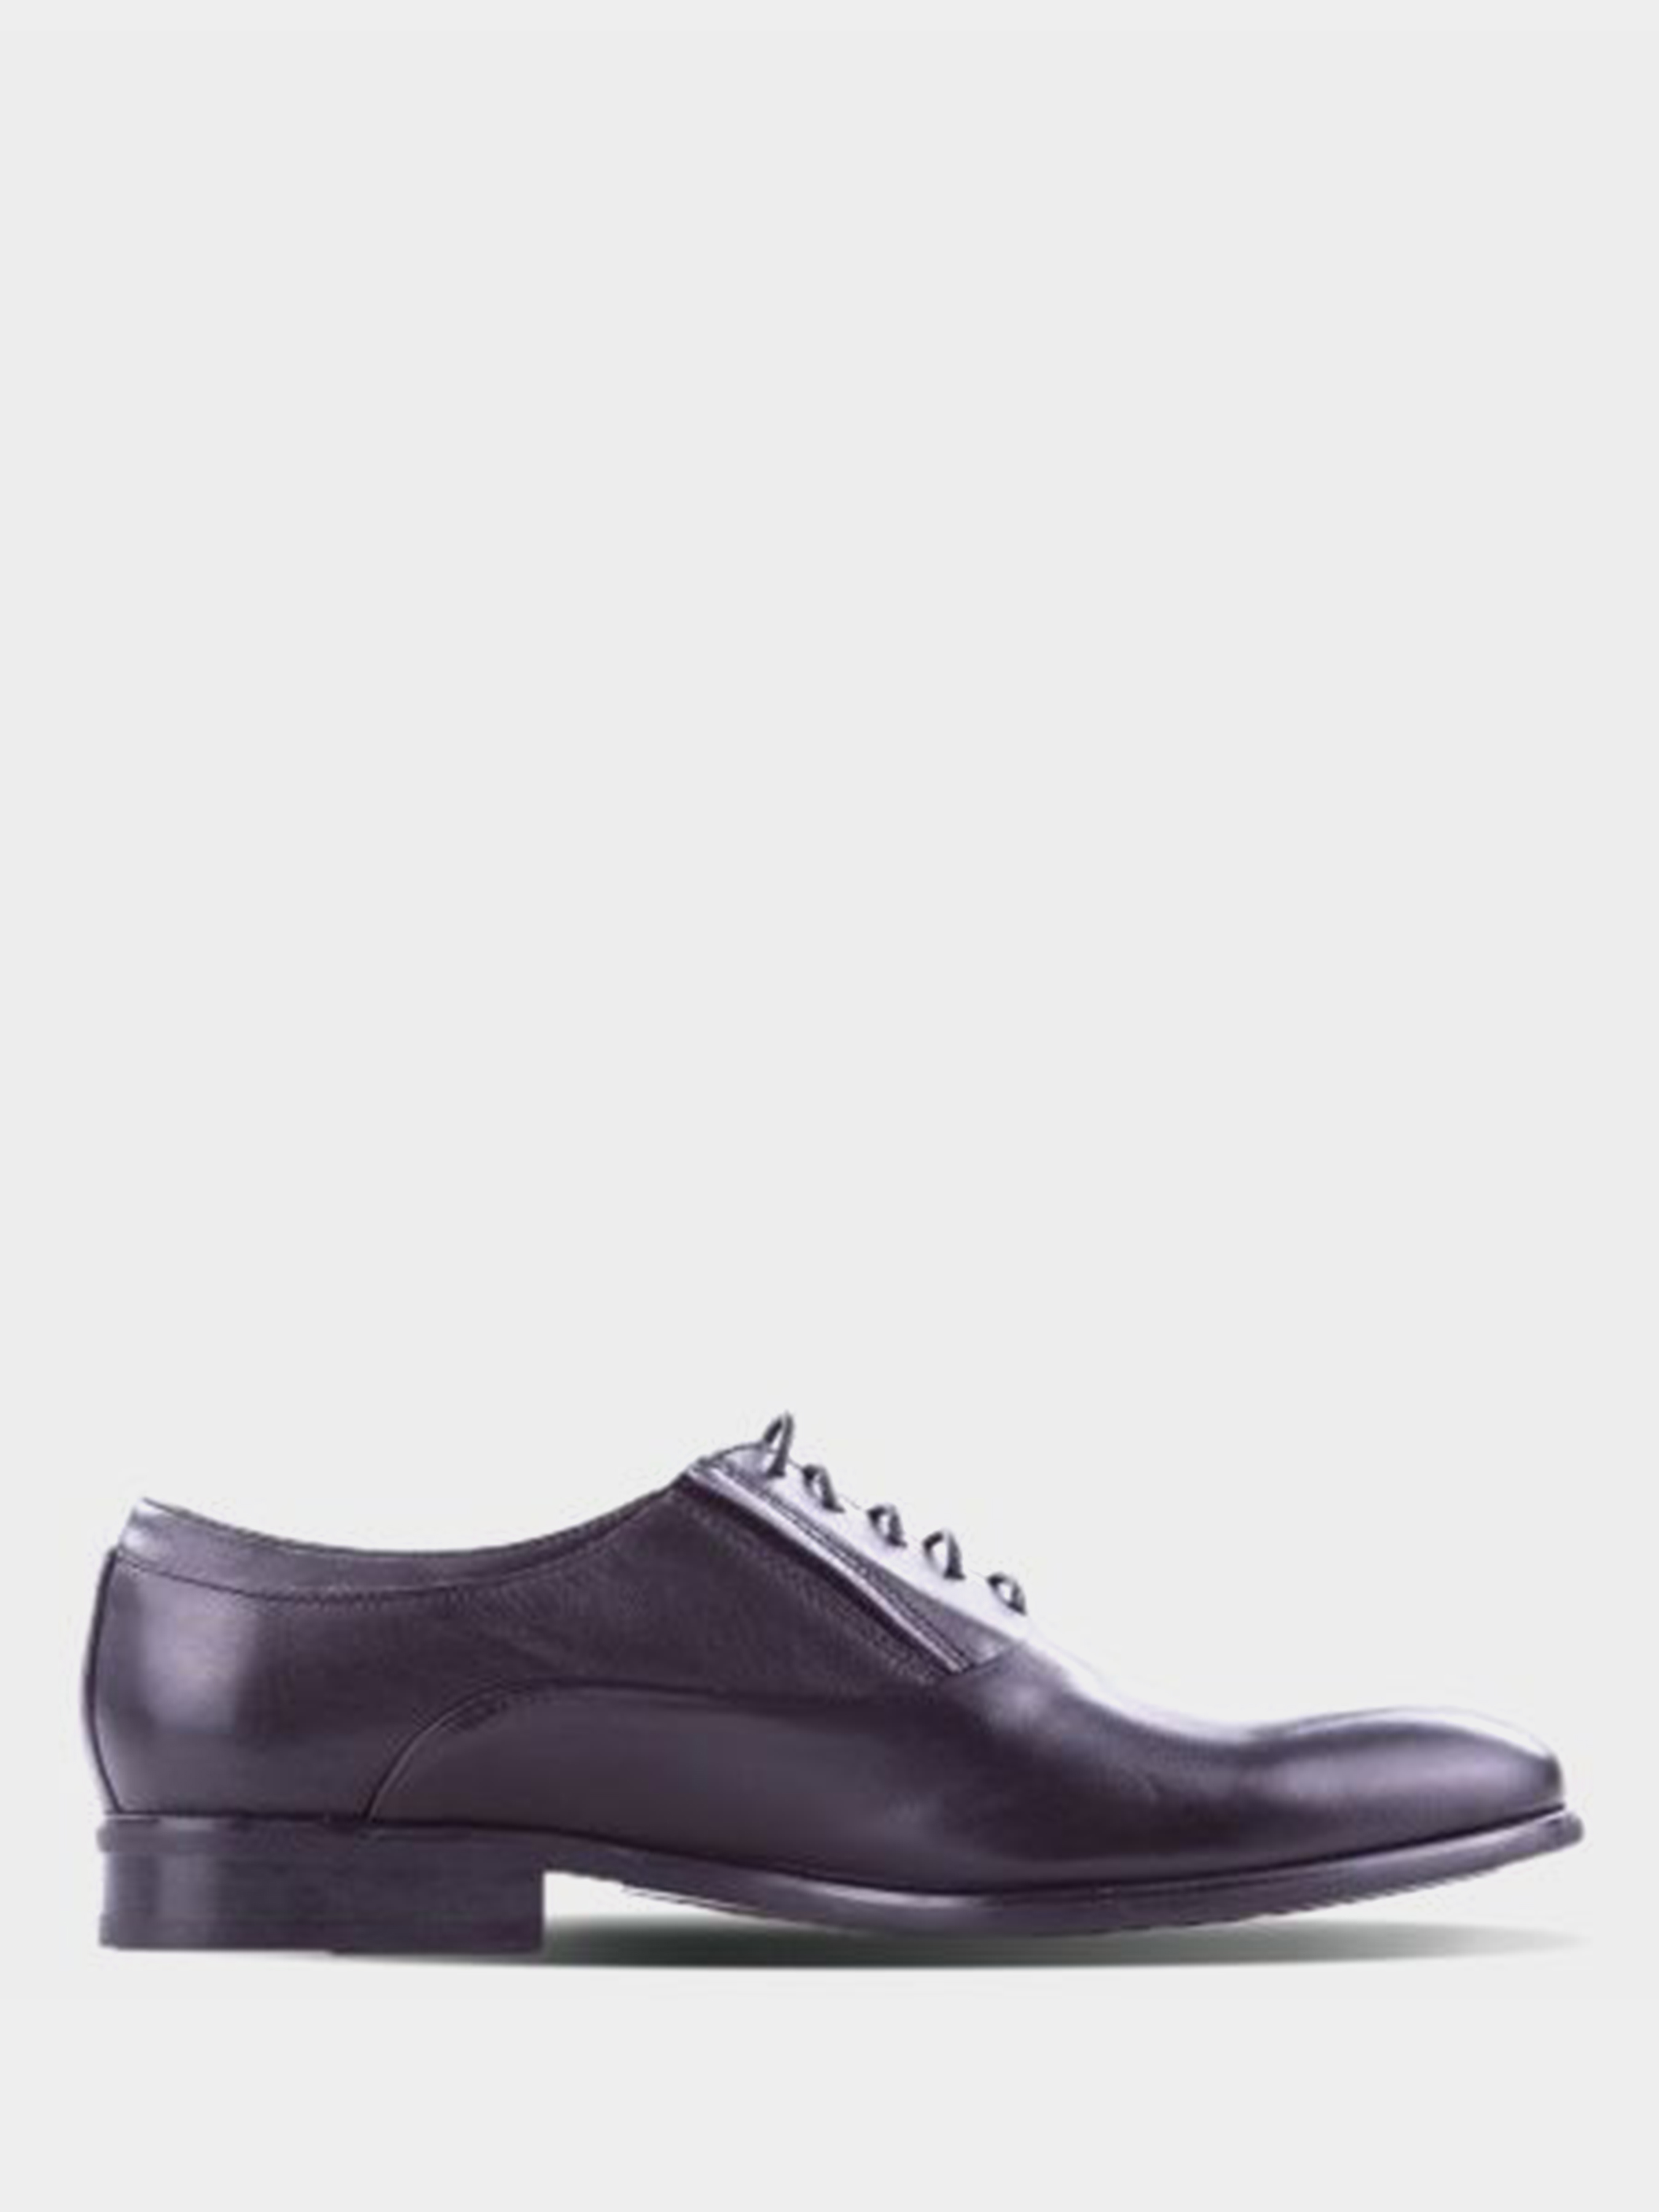 Полуботинки для мужчин Ан-Юс 8H22 размерная сетка обуви, 2017